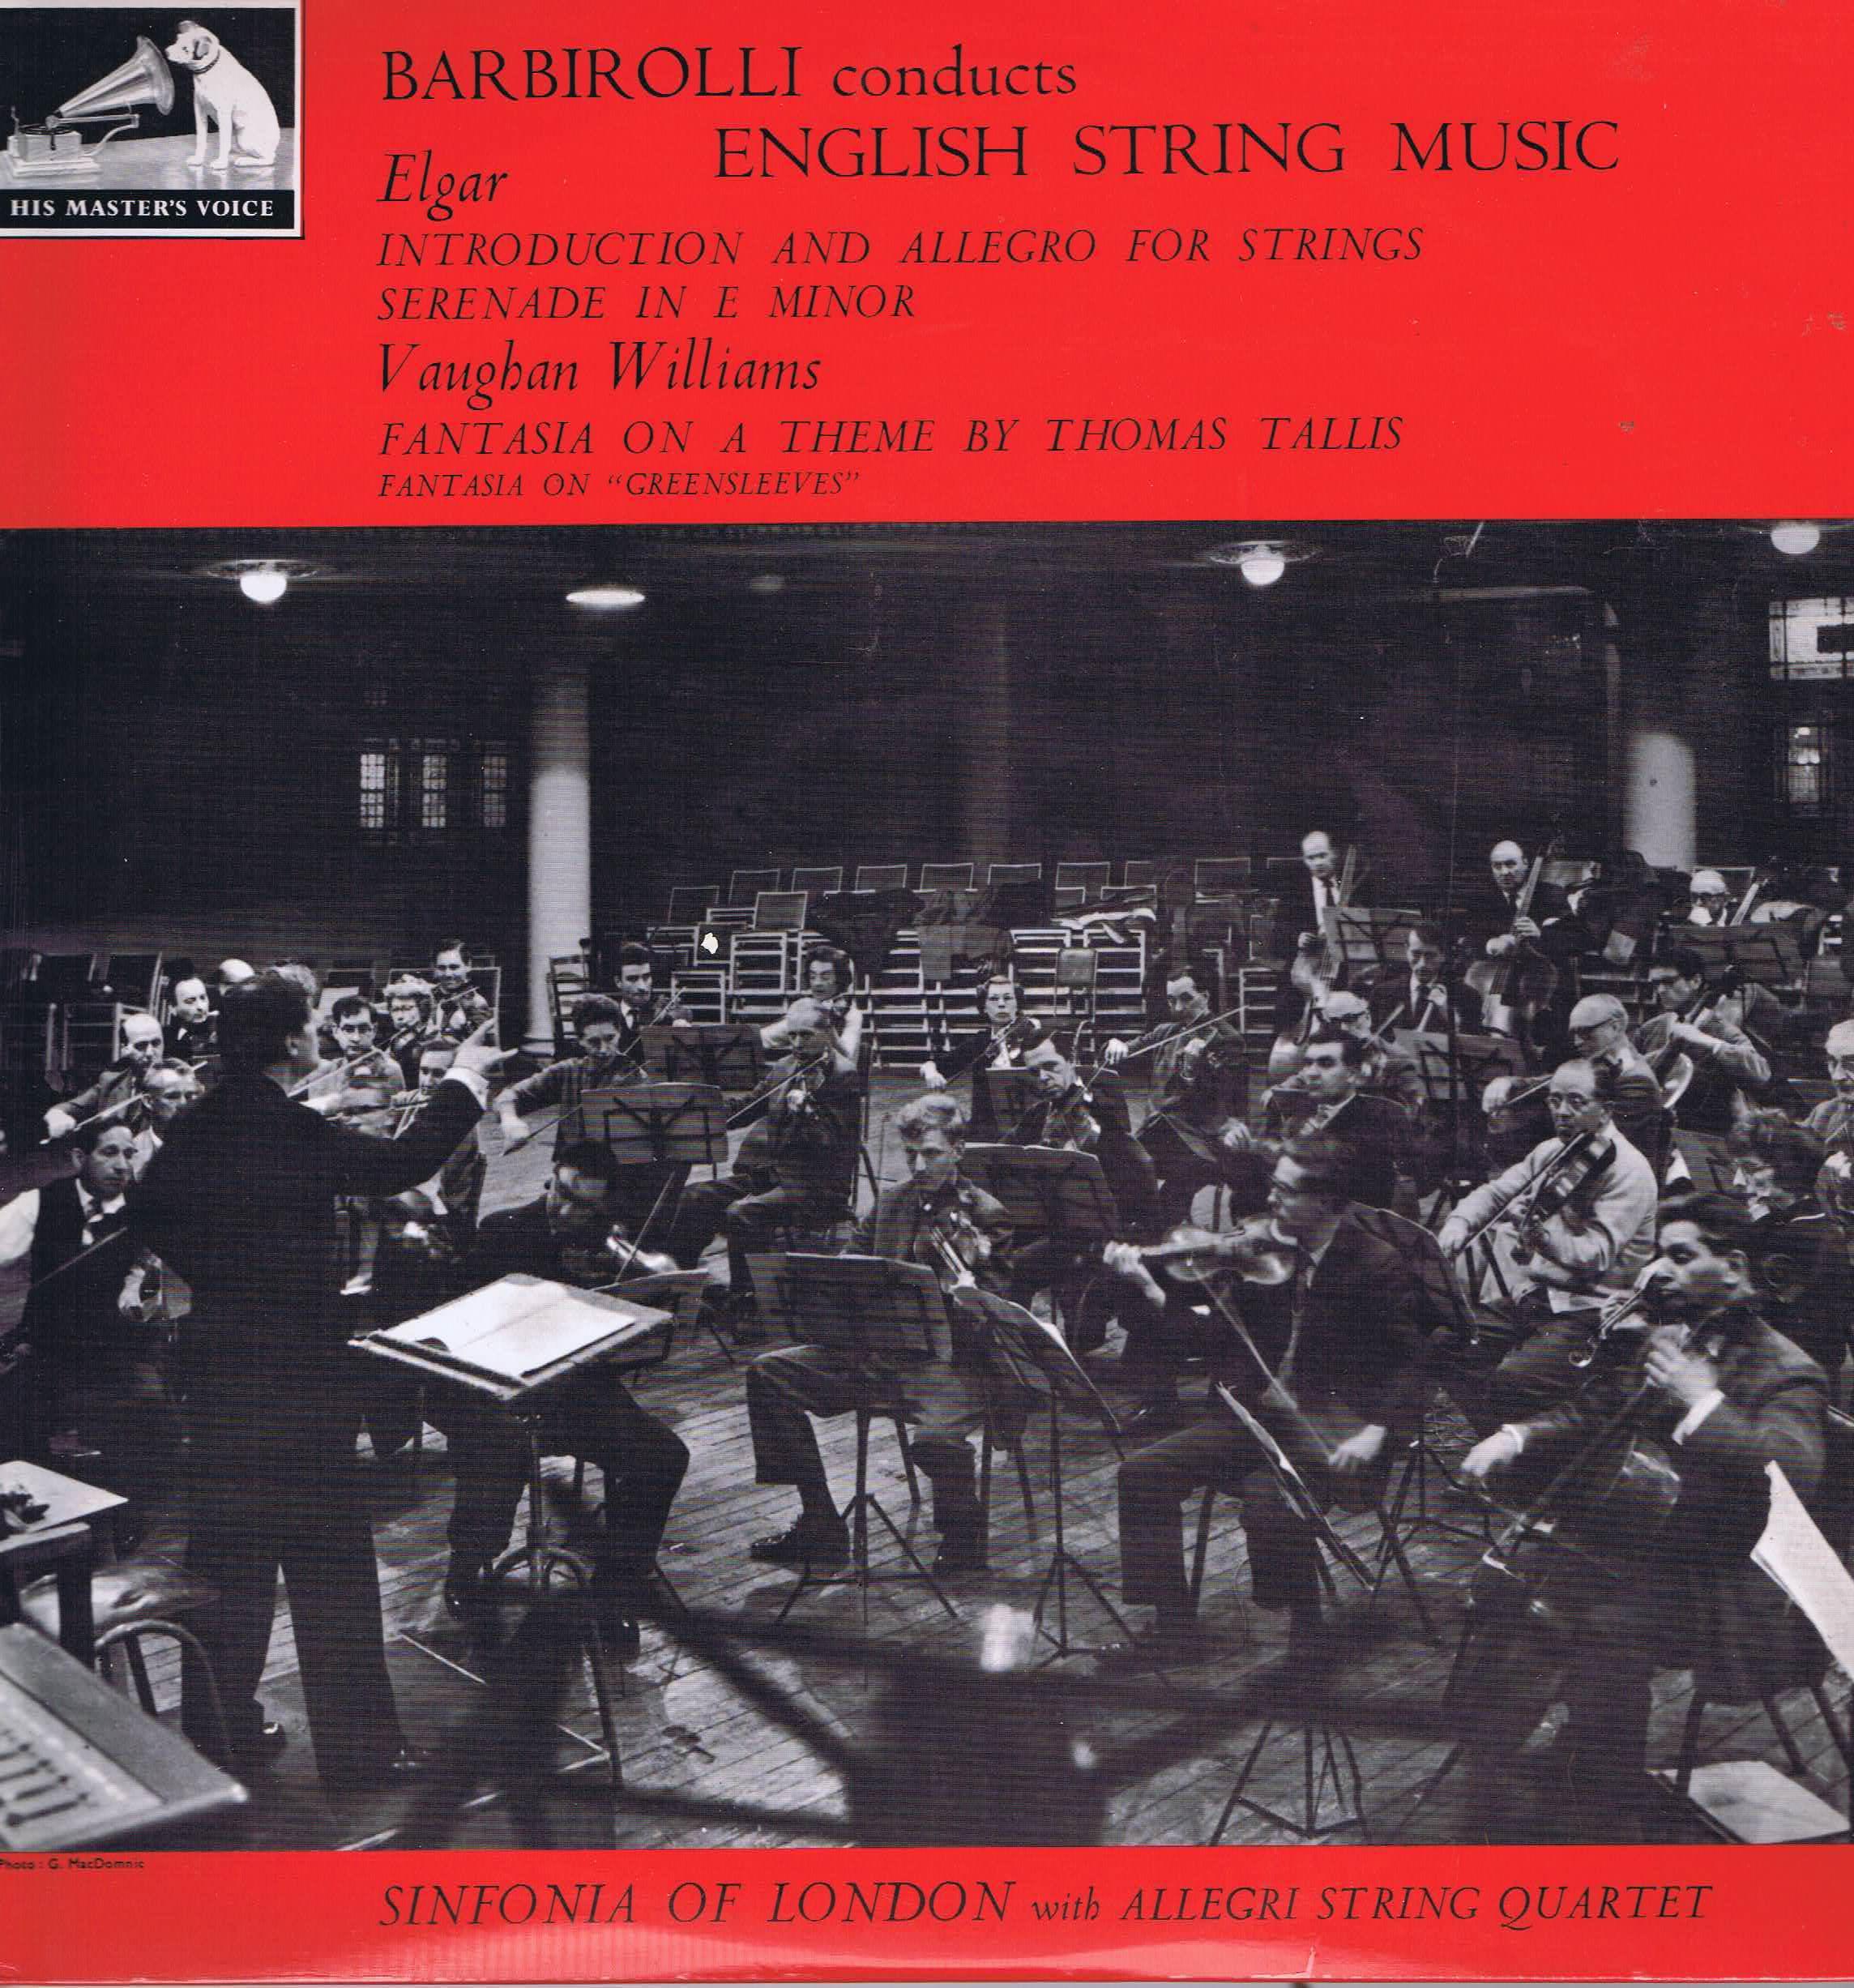 Image result for english string music elgar